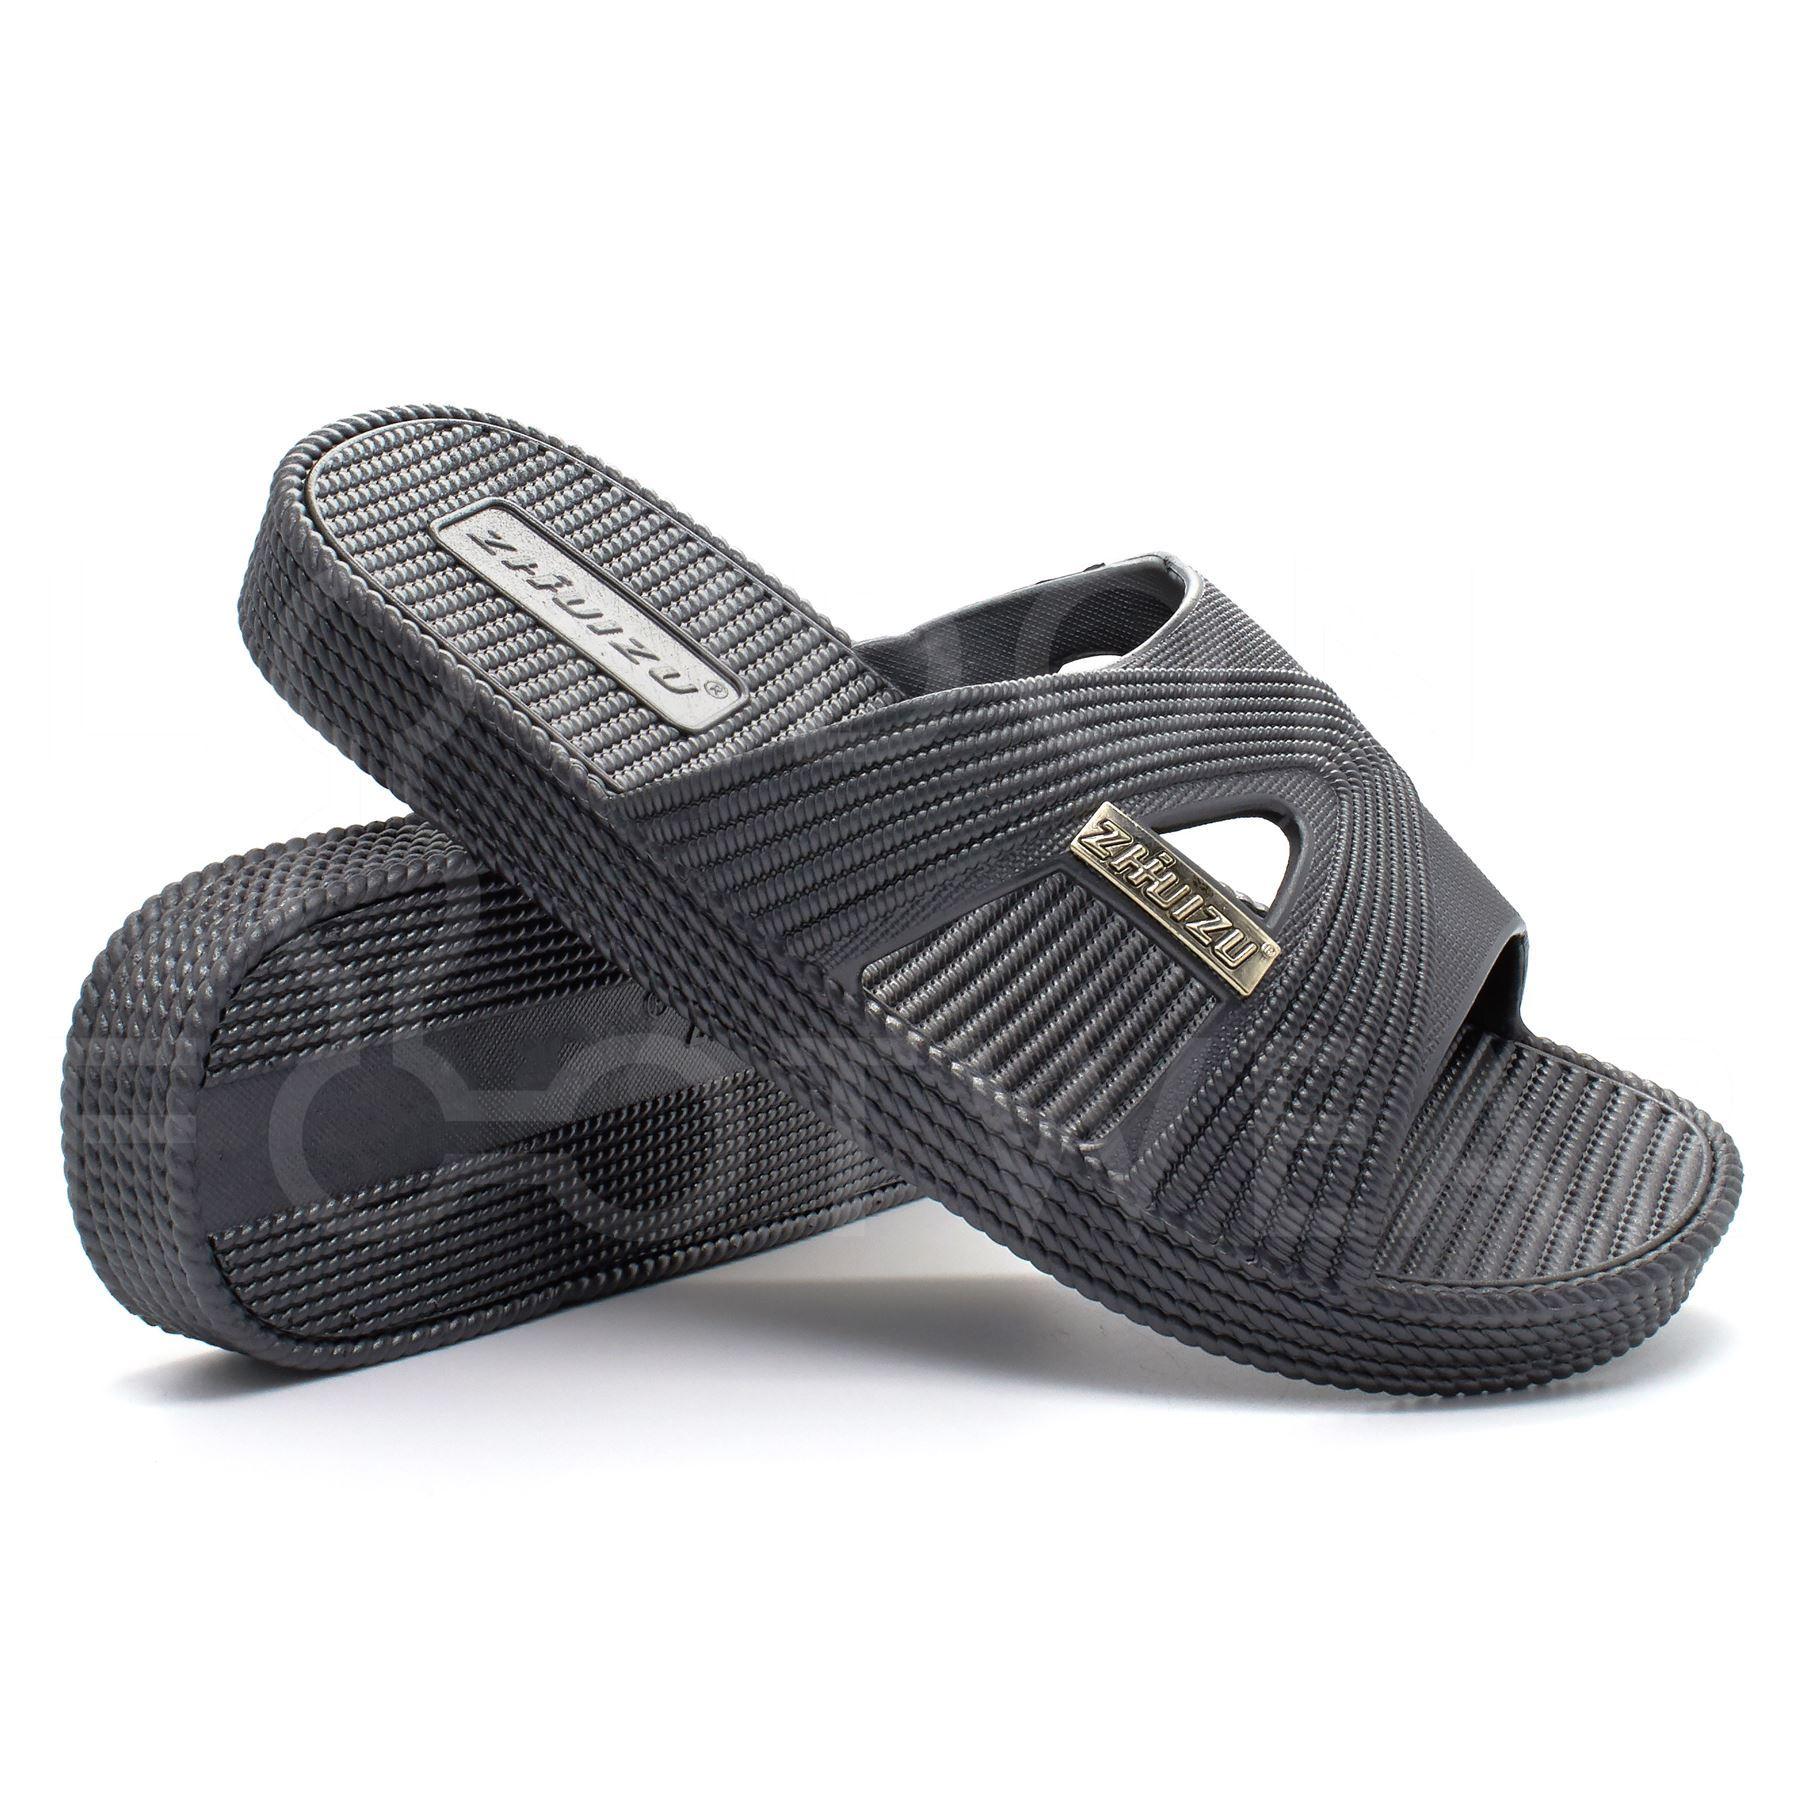 Mens resbalón en playa piscina deslizadores Ducha Sandalias Ojotas de Fitness Zapatos de Natación